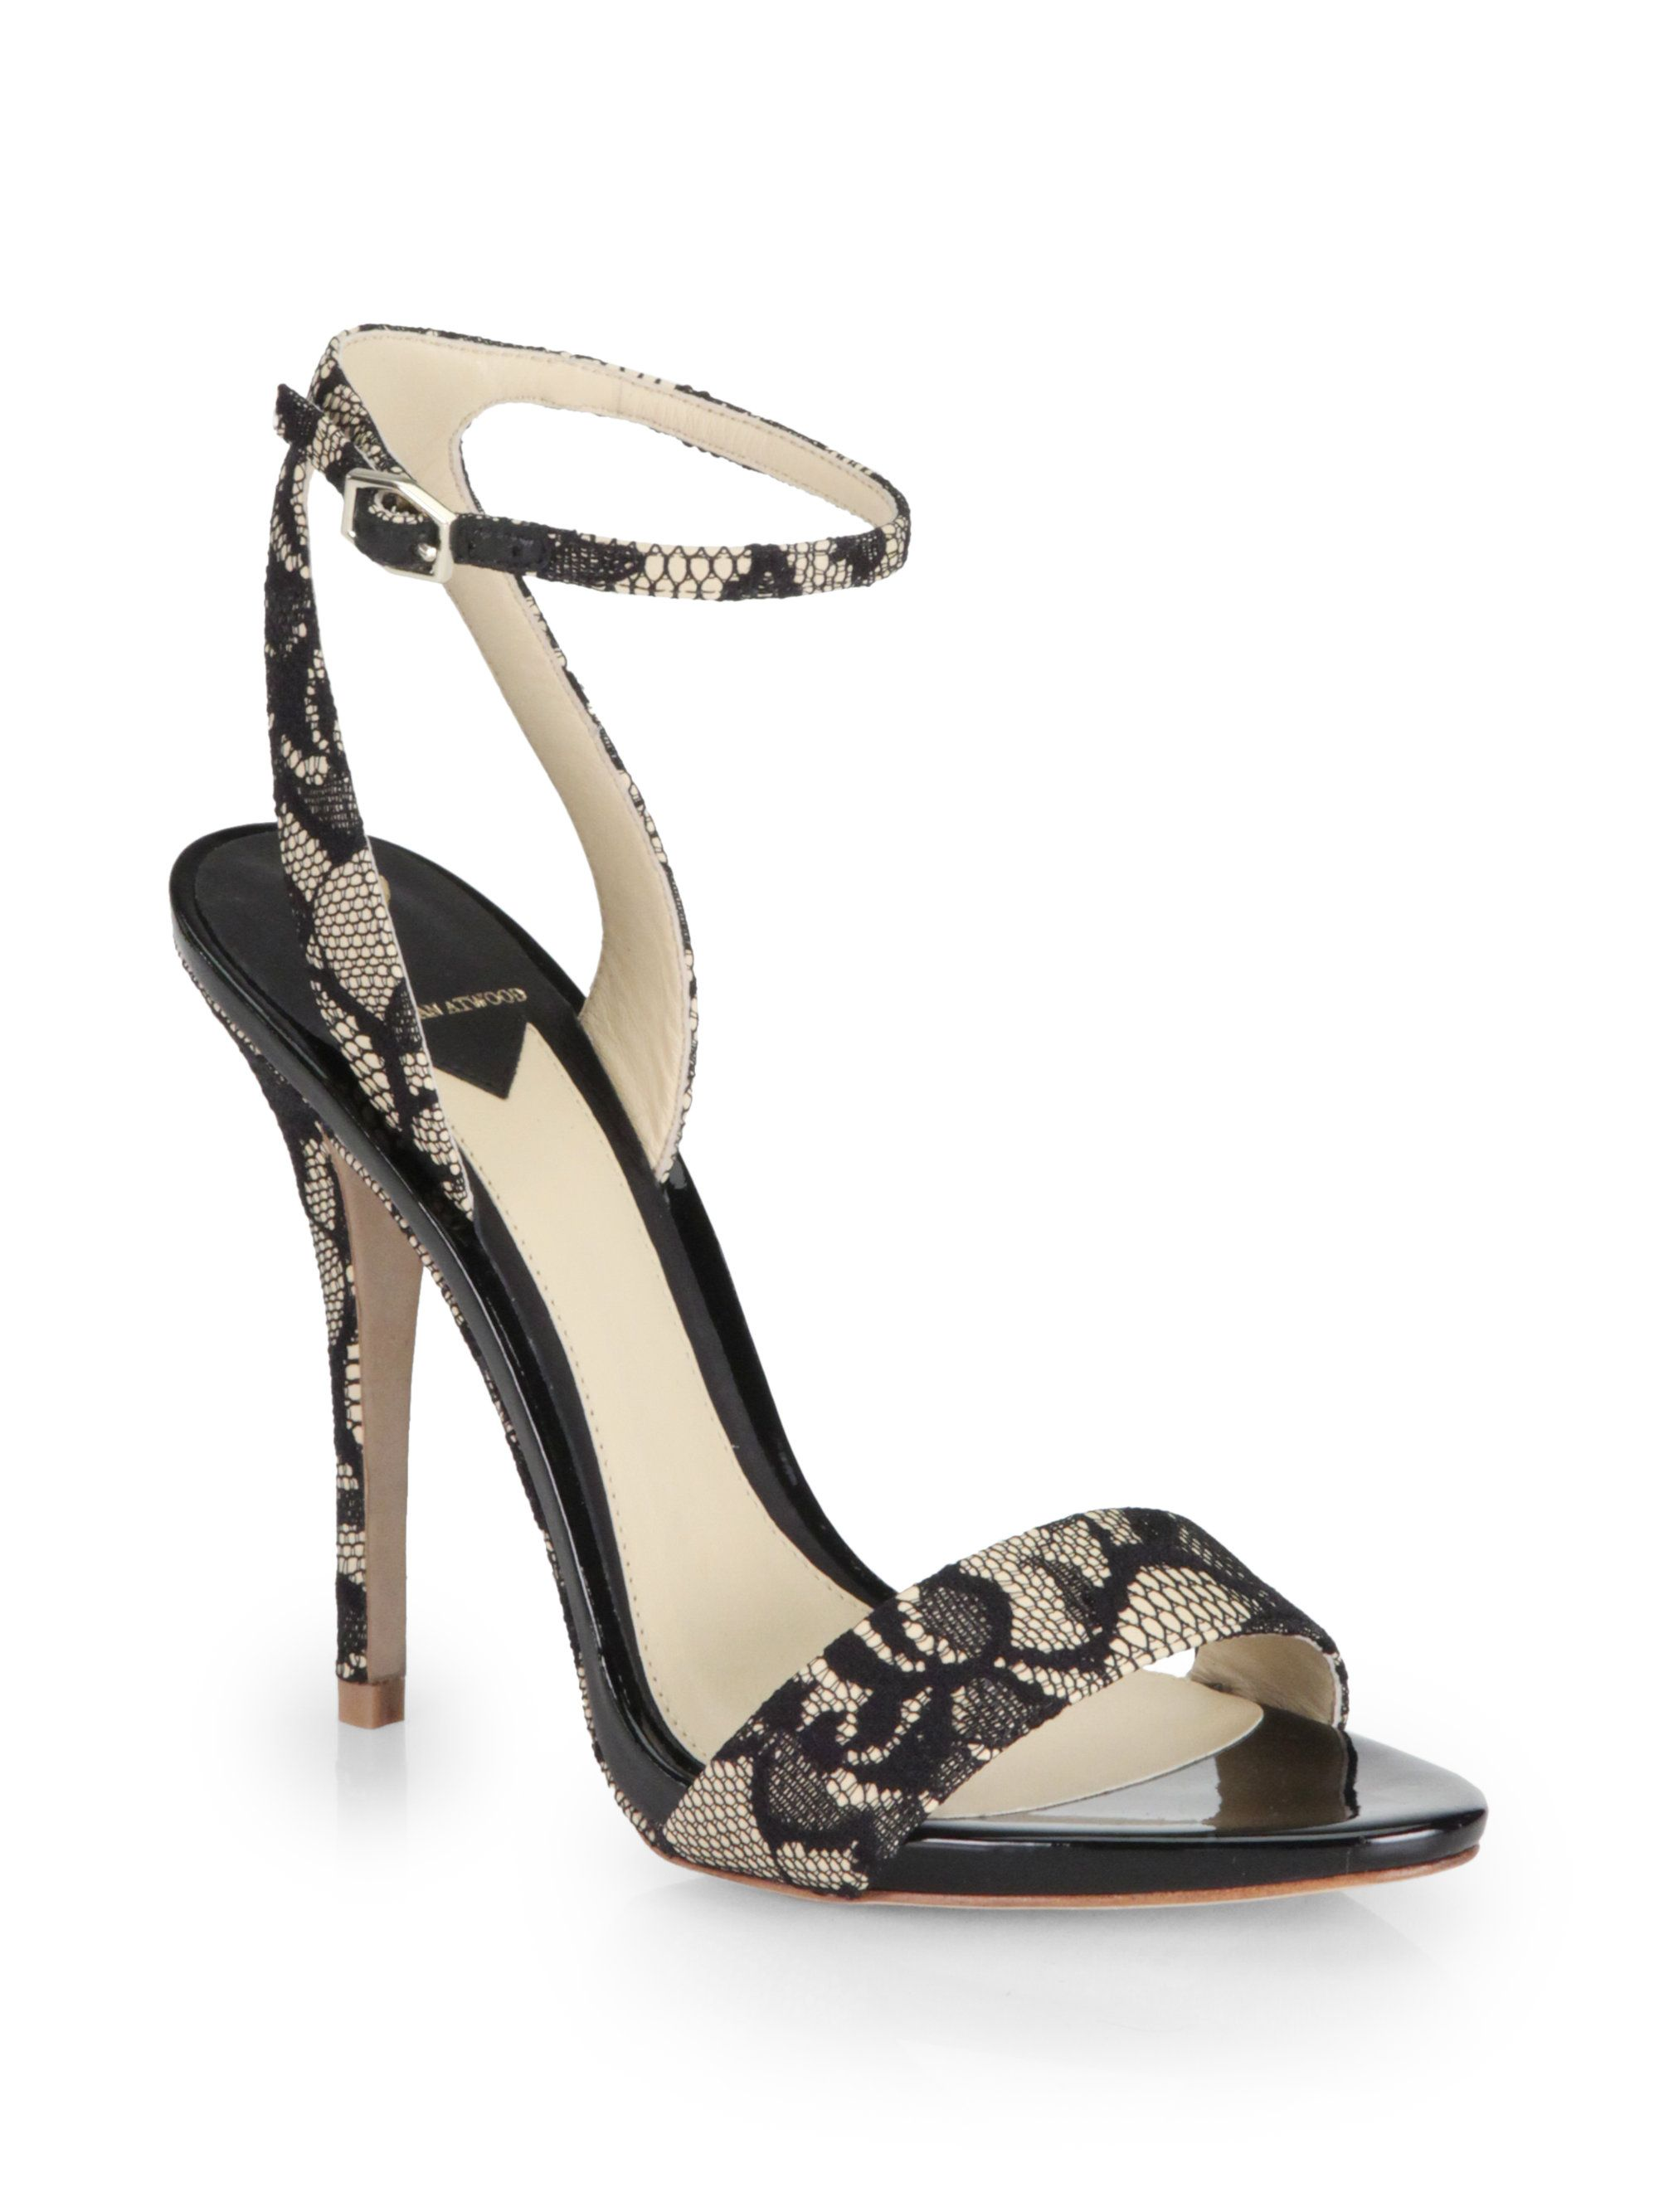 B Brian Atwood Peep-Toe Ankle Strap Pumps for sale finishline V1NEc